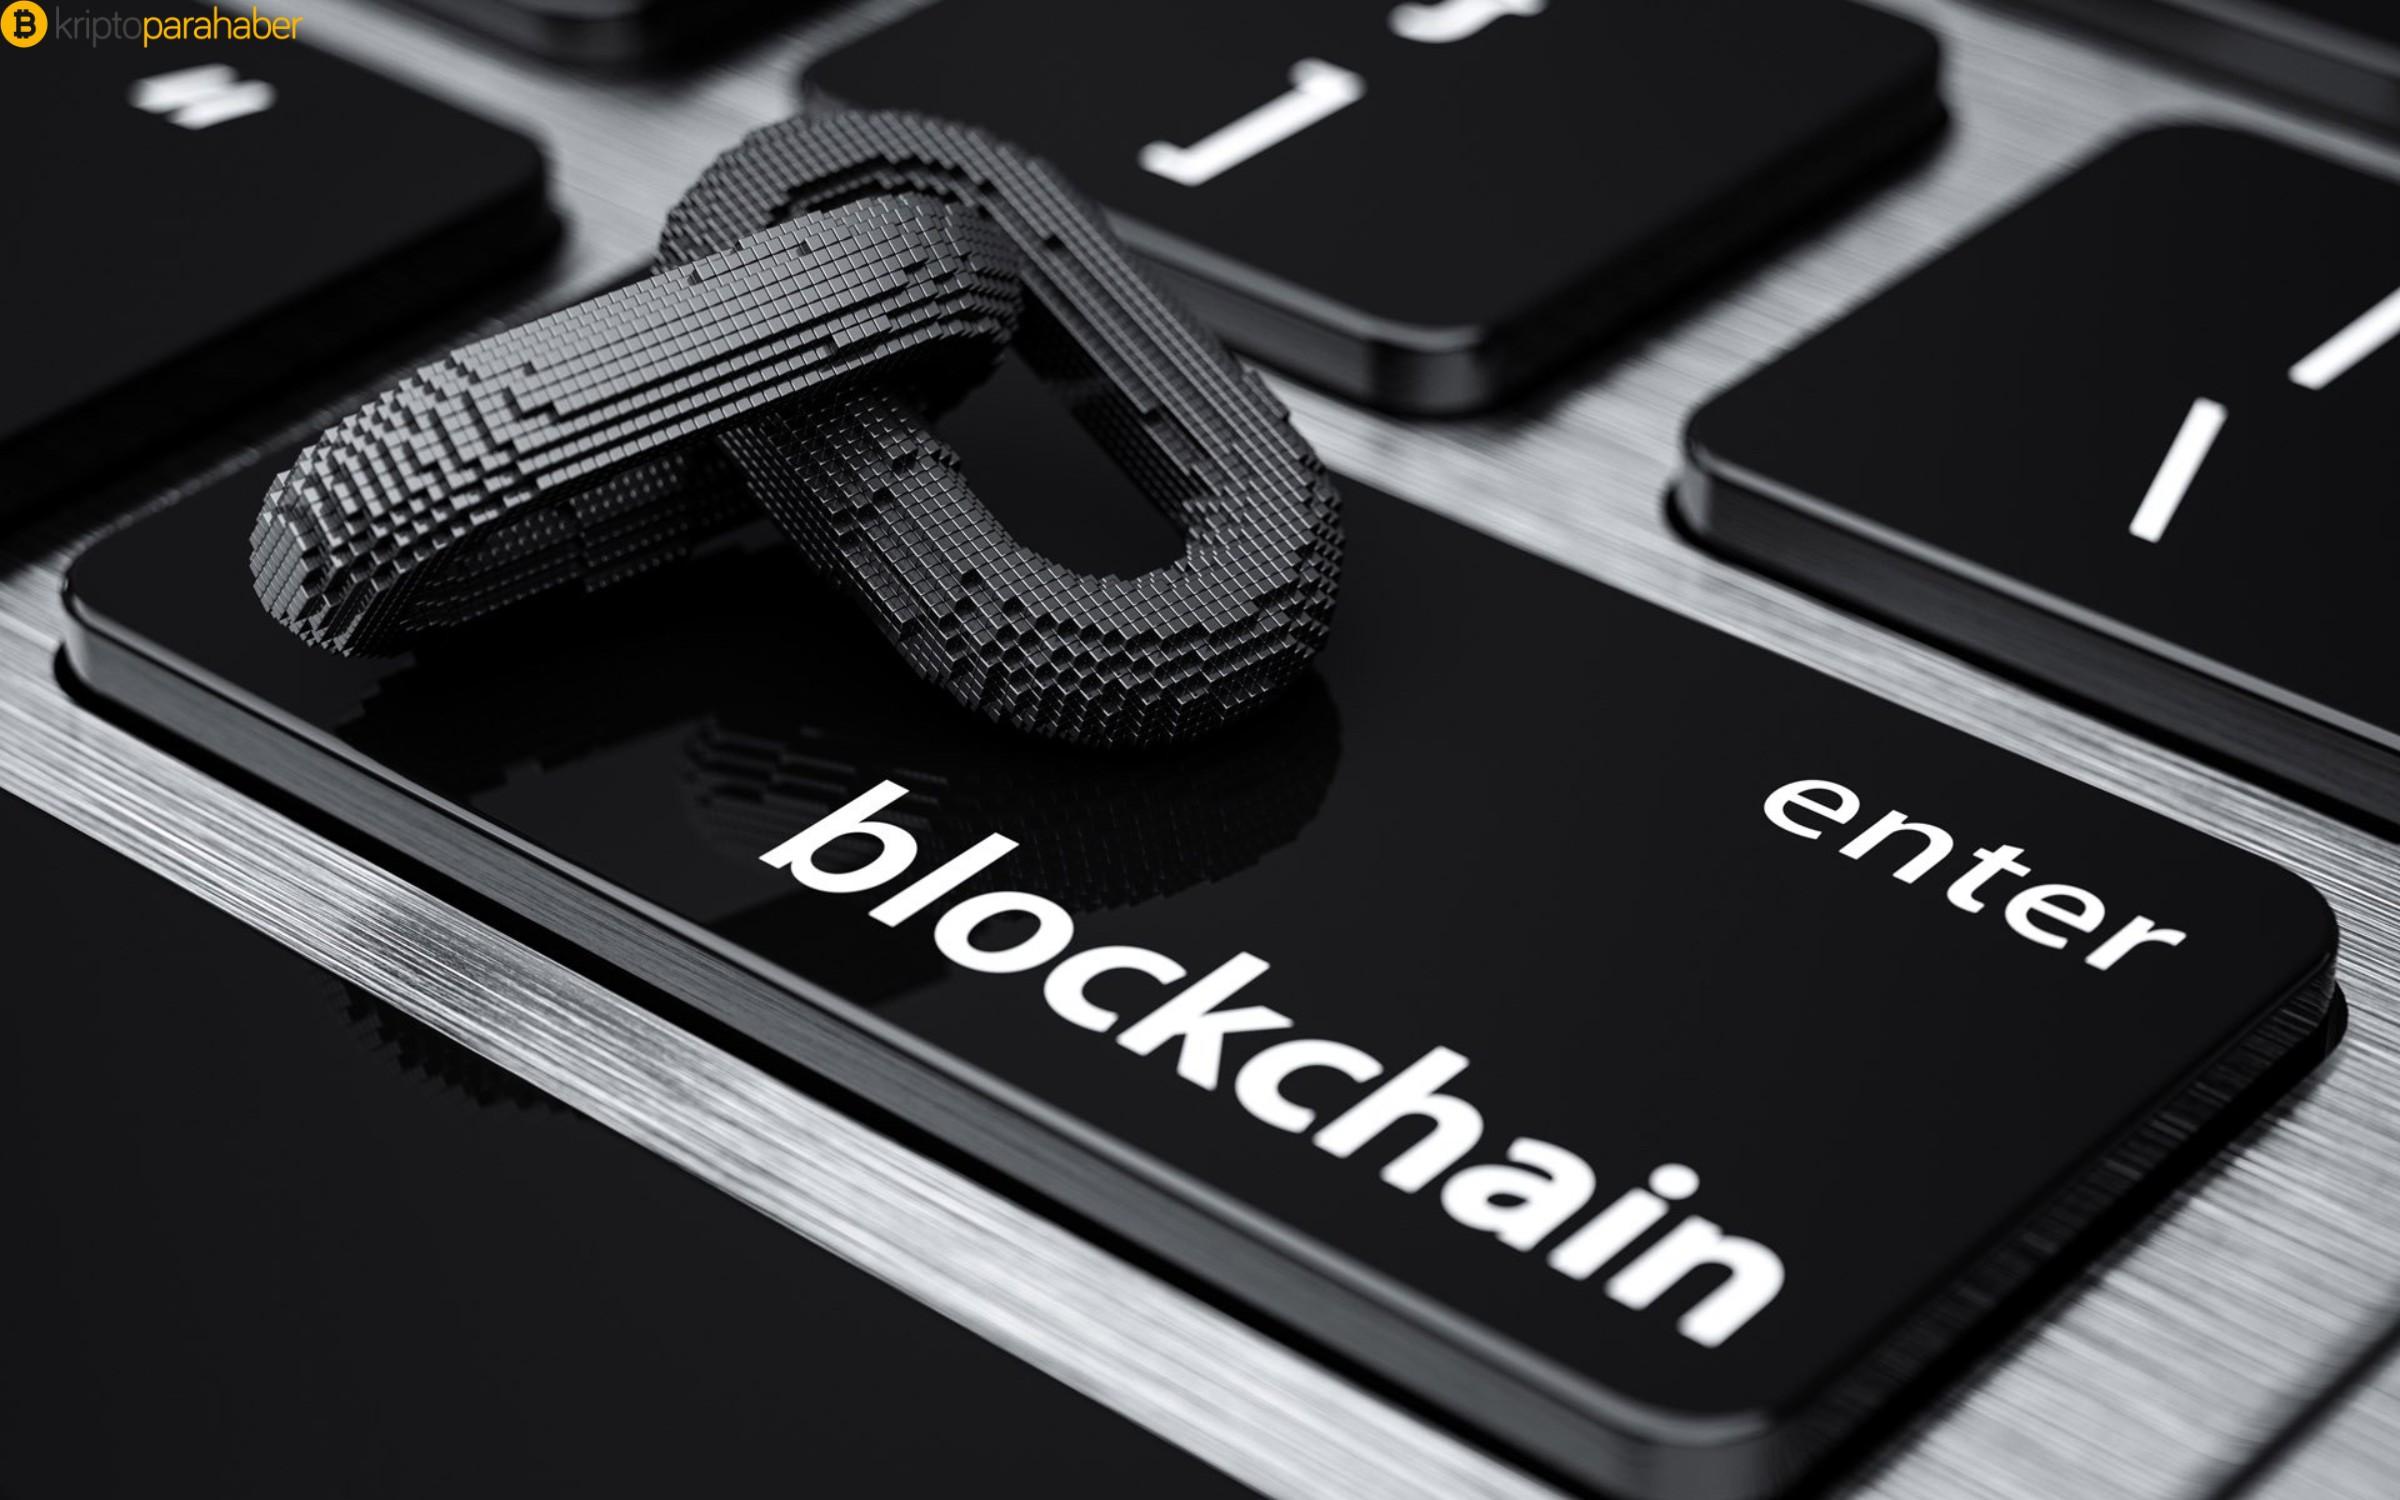 SEC, ismine Blockchain ekleyen Long Blockchain'i mahkemeye verdi